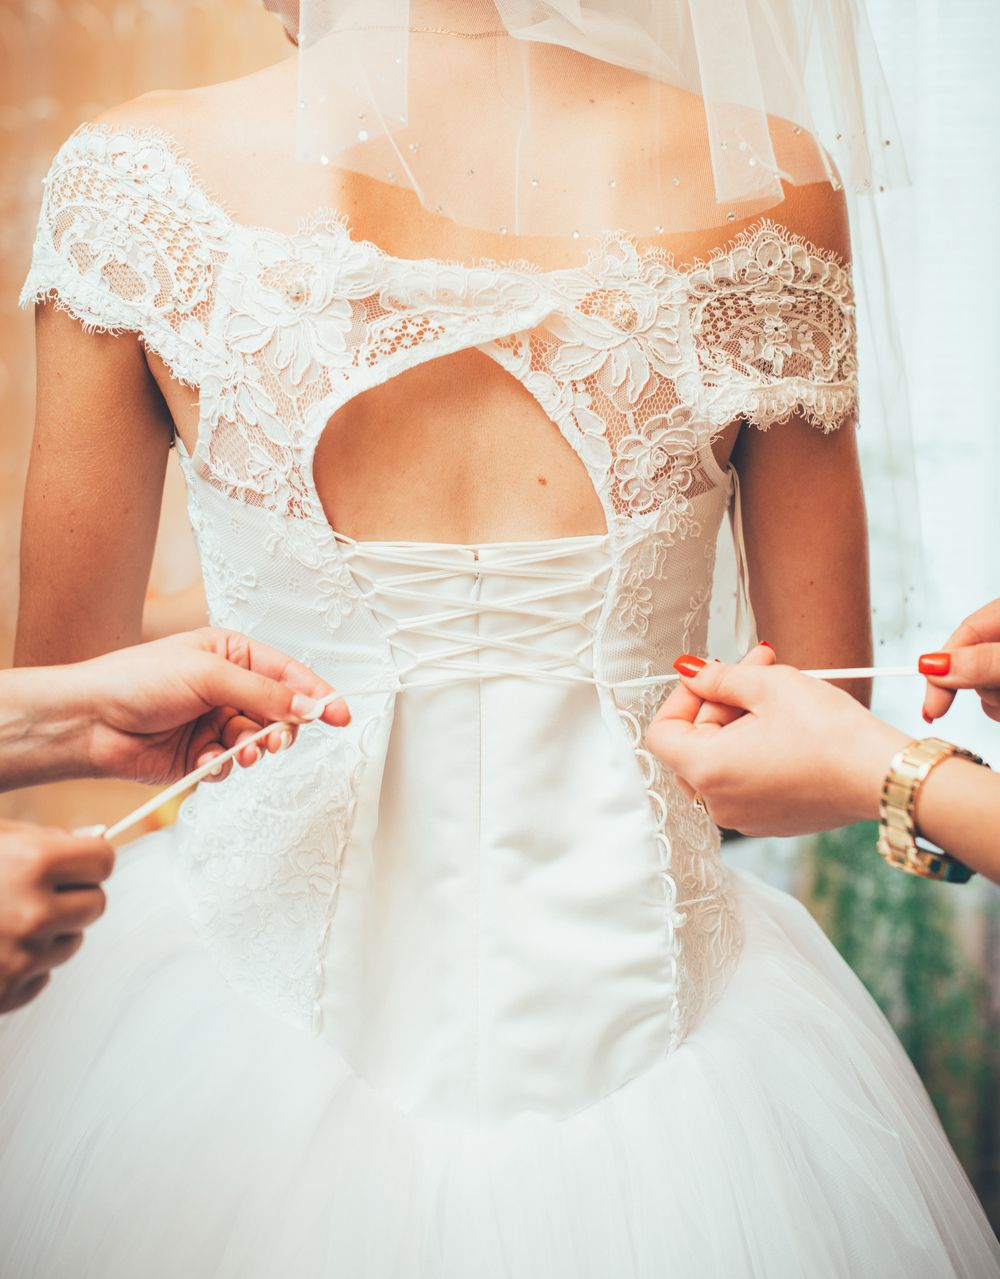 99+ Wedding Dress Tailor - Wedding Dresses for the Mature Bride ...